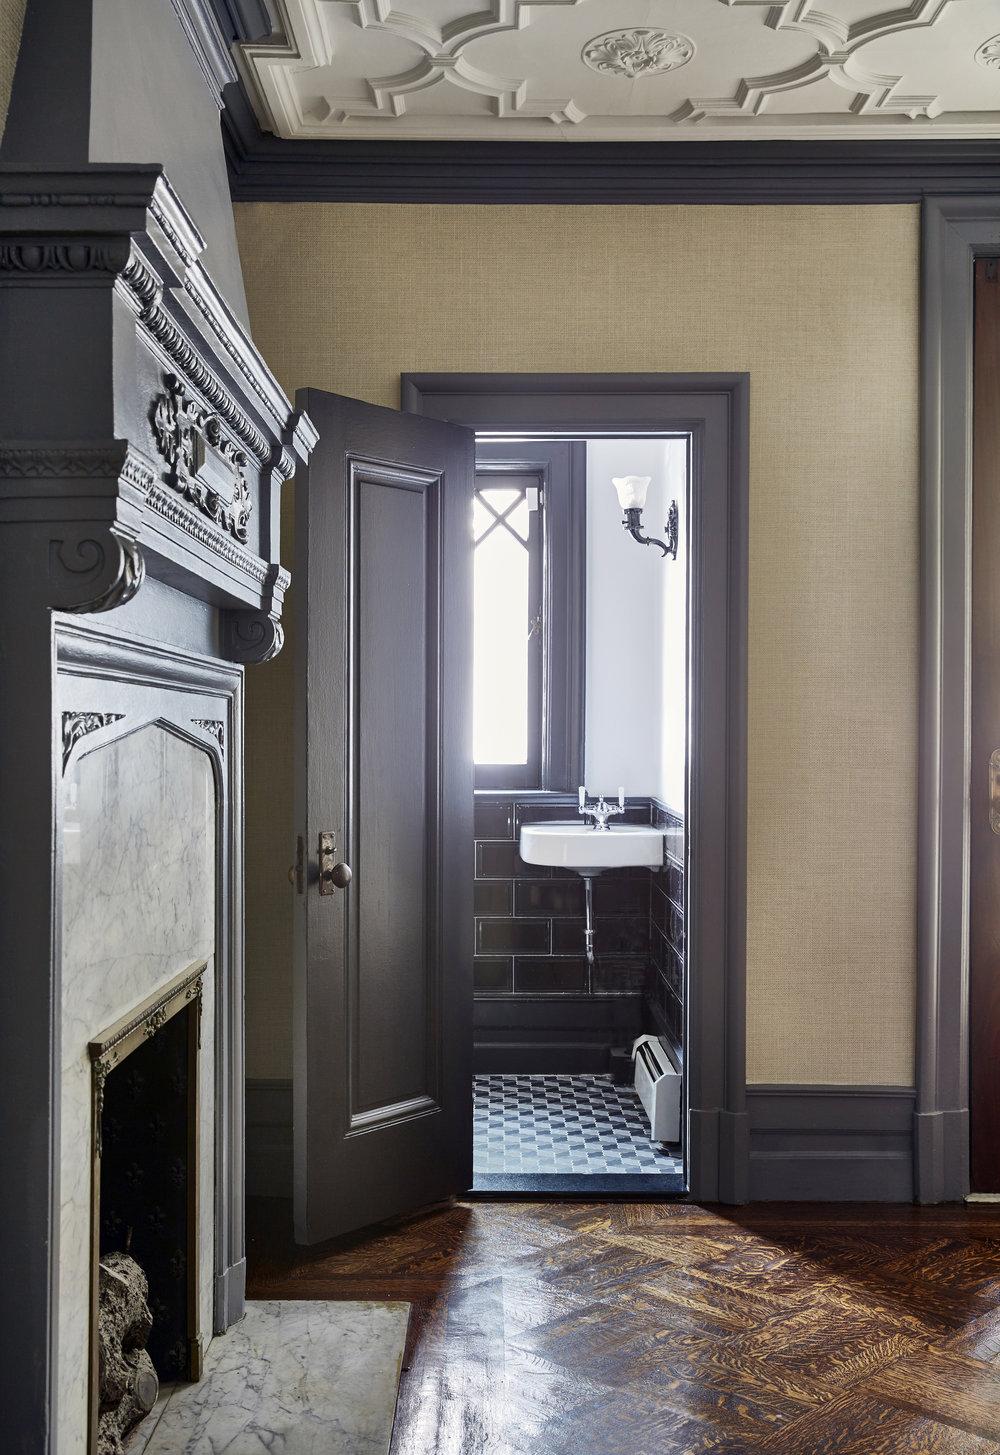 Caroll-Street-Fireplace-Townhouse-JMorris-Design-Interior-Designer-Brooklyn-New-York-Online.jpg